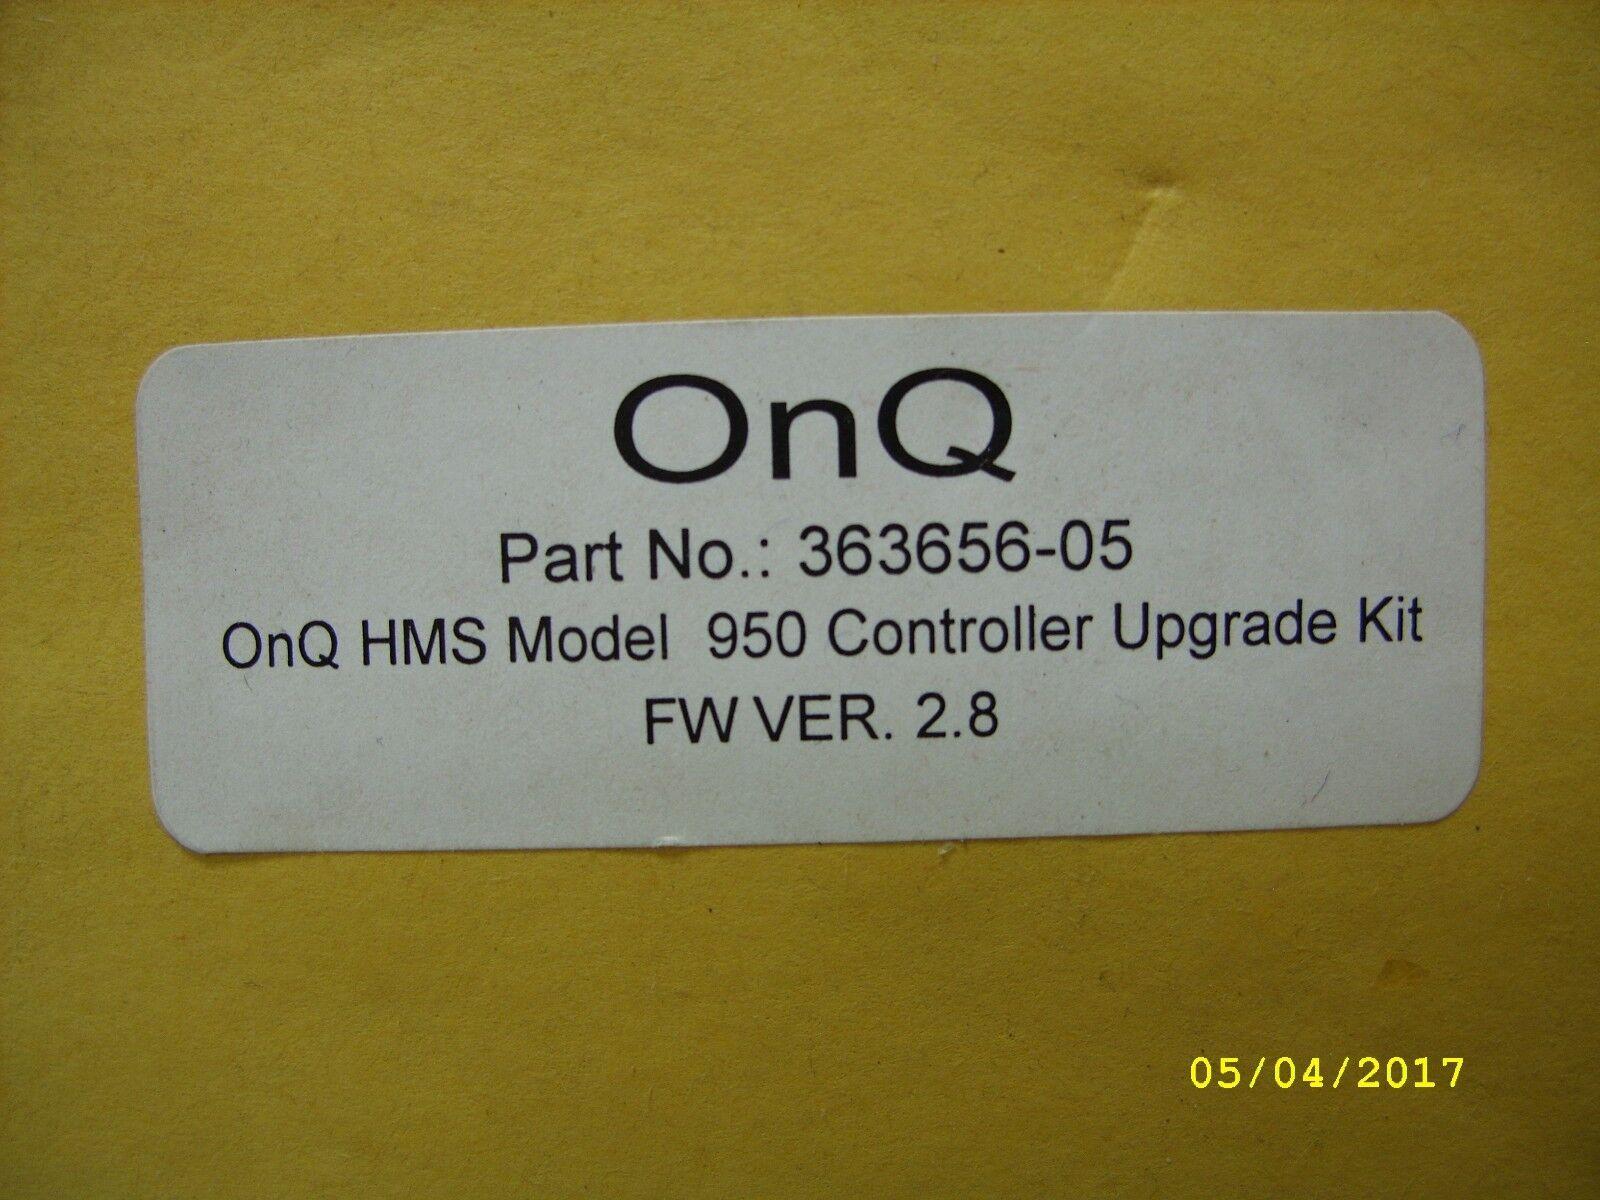 OnQ Legrand - HMS 950 Controller Firmware Upgrade Chip Ver. 2.8 - 3636560-05